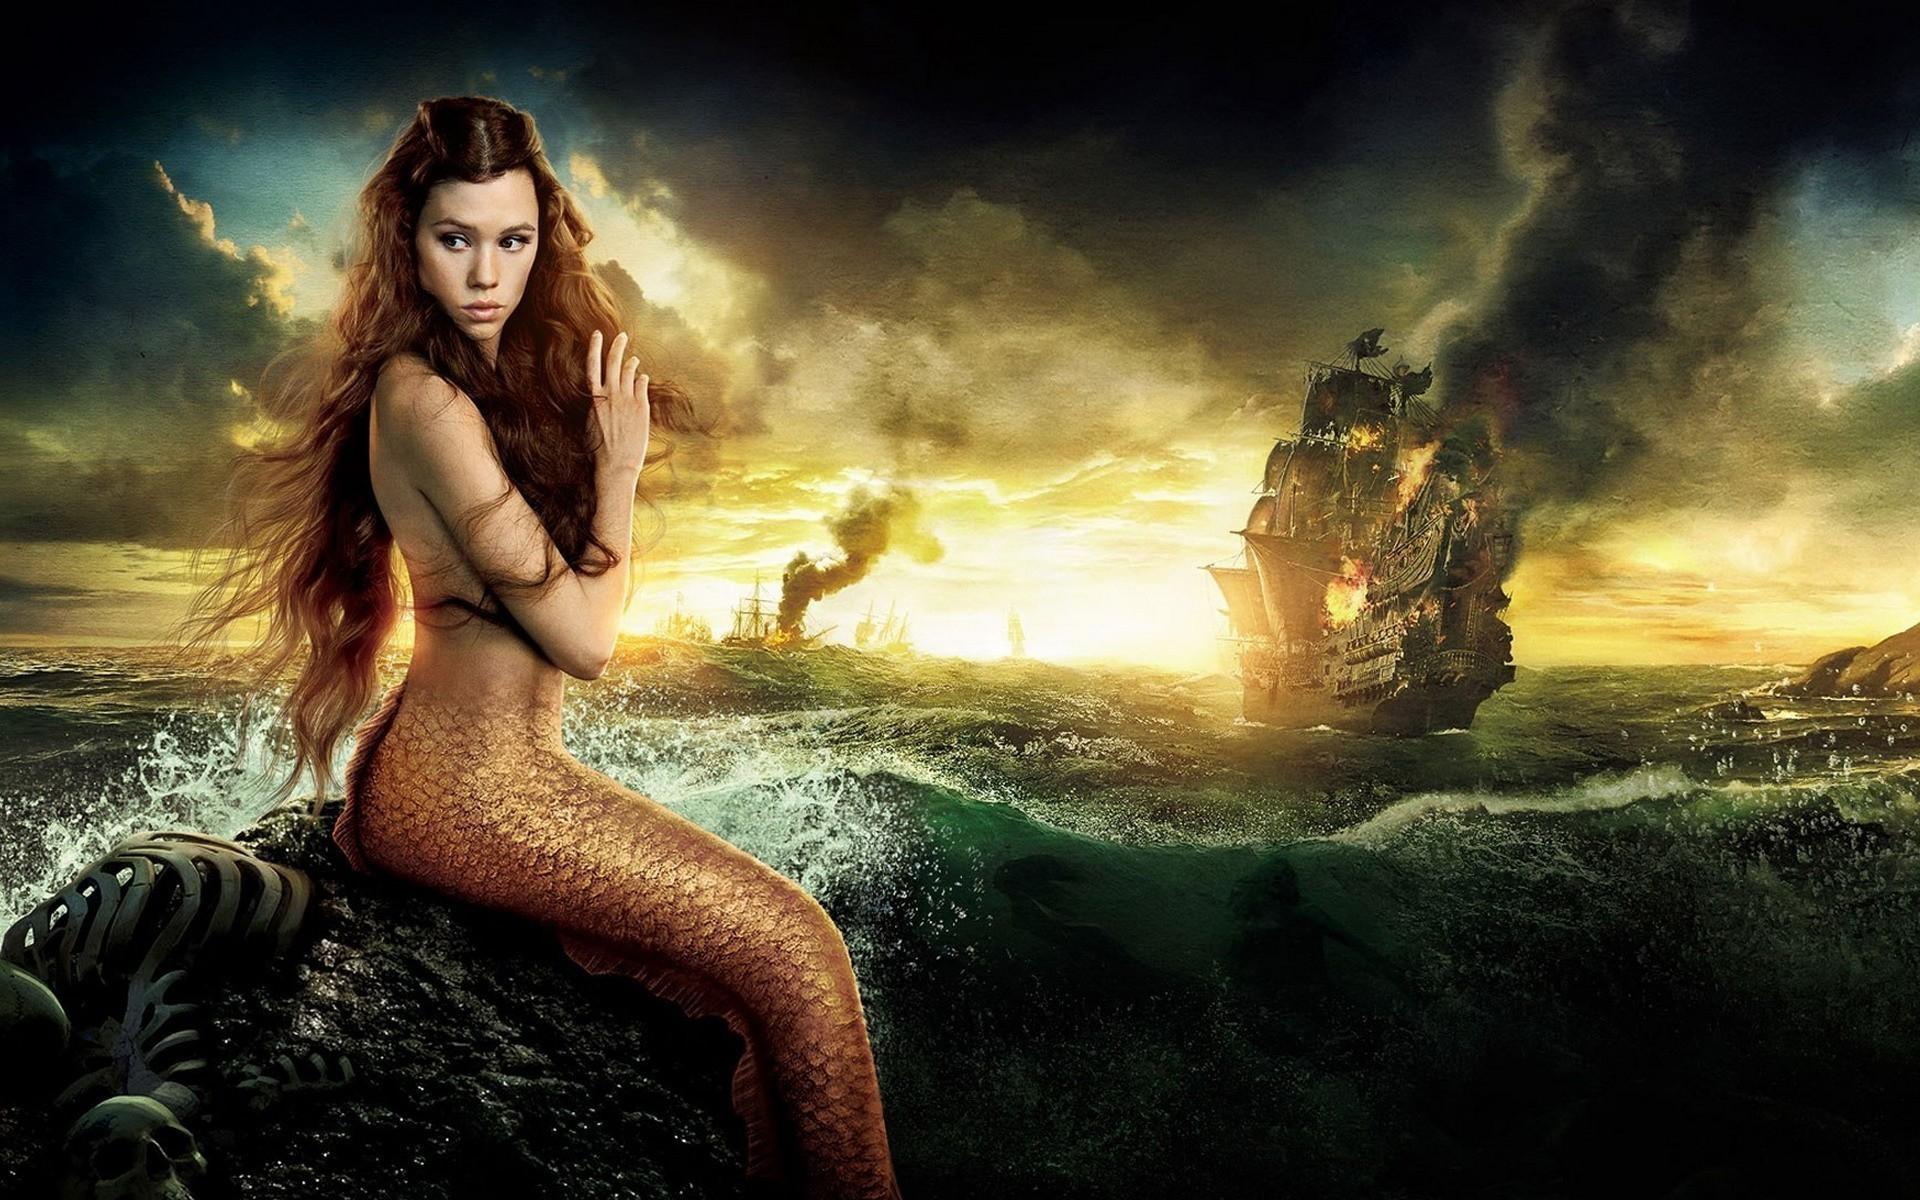 More Movies desktop wallpapers